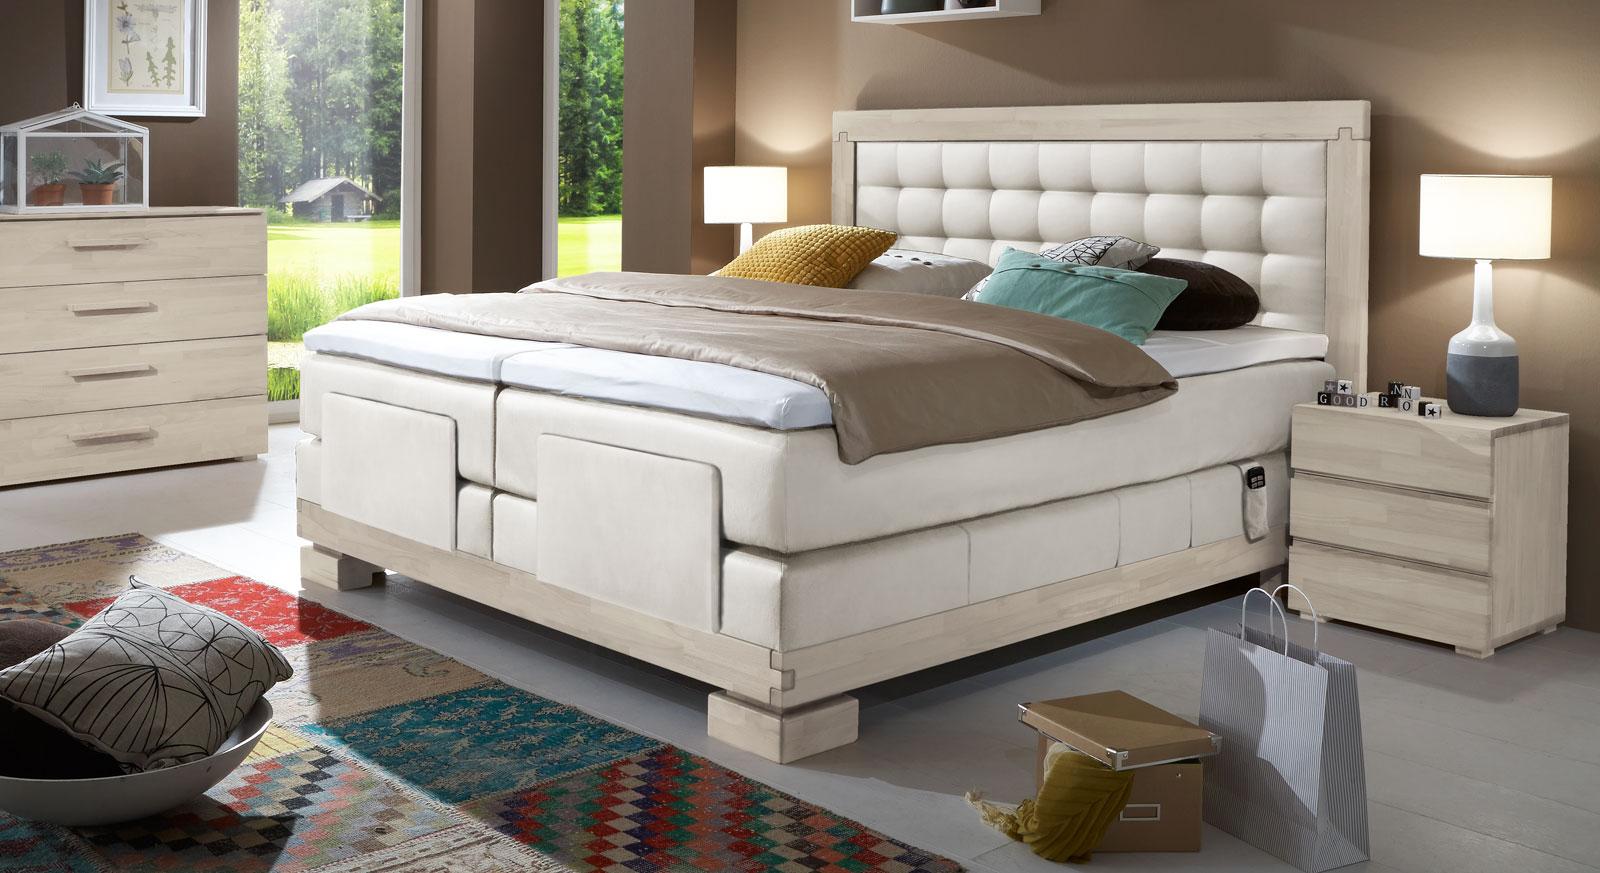 boxspringbett in 160x200 mit motor viterbus elektro. Black Bedroom Furniture Sets. Home Design Ideas